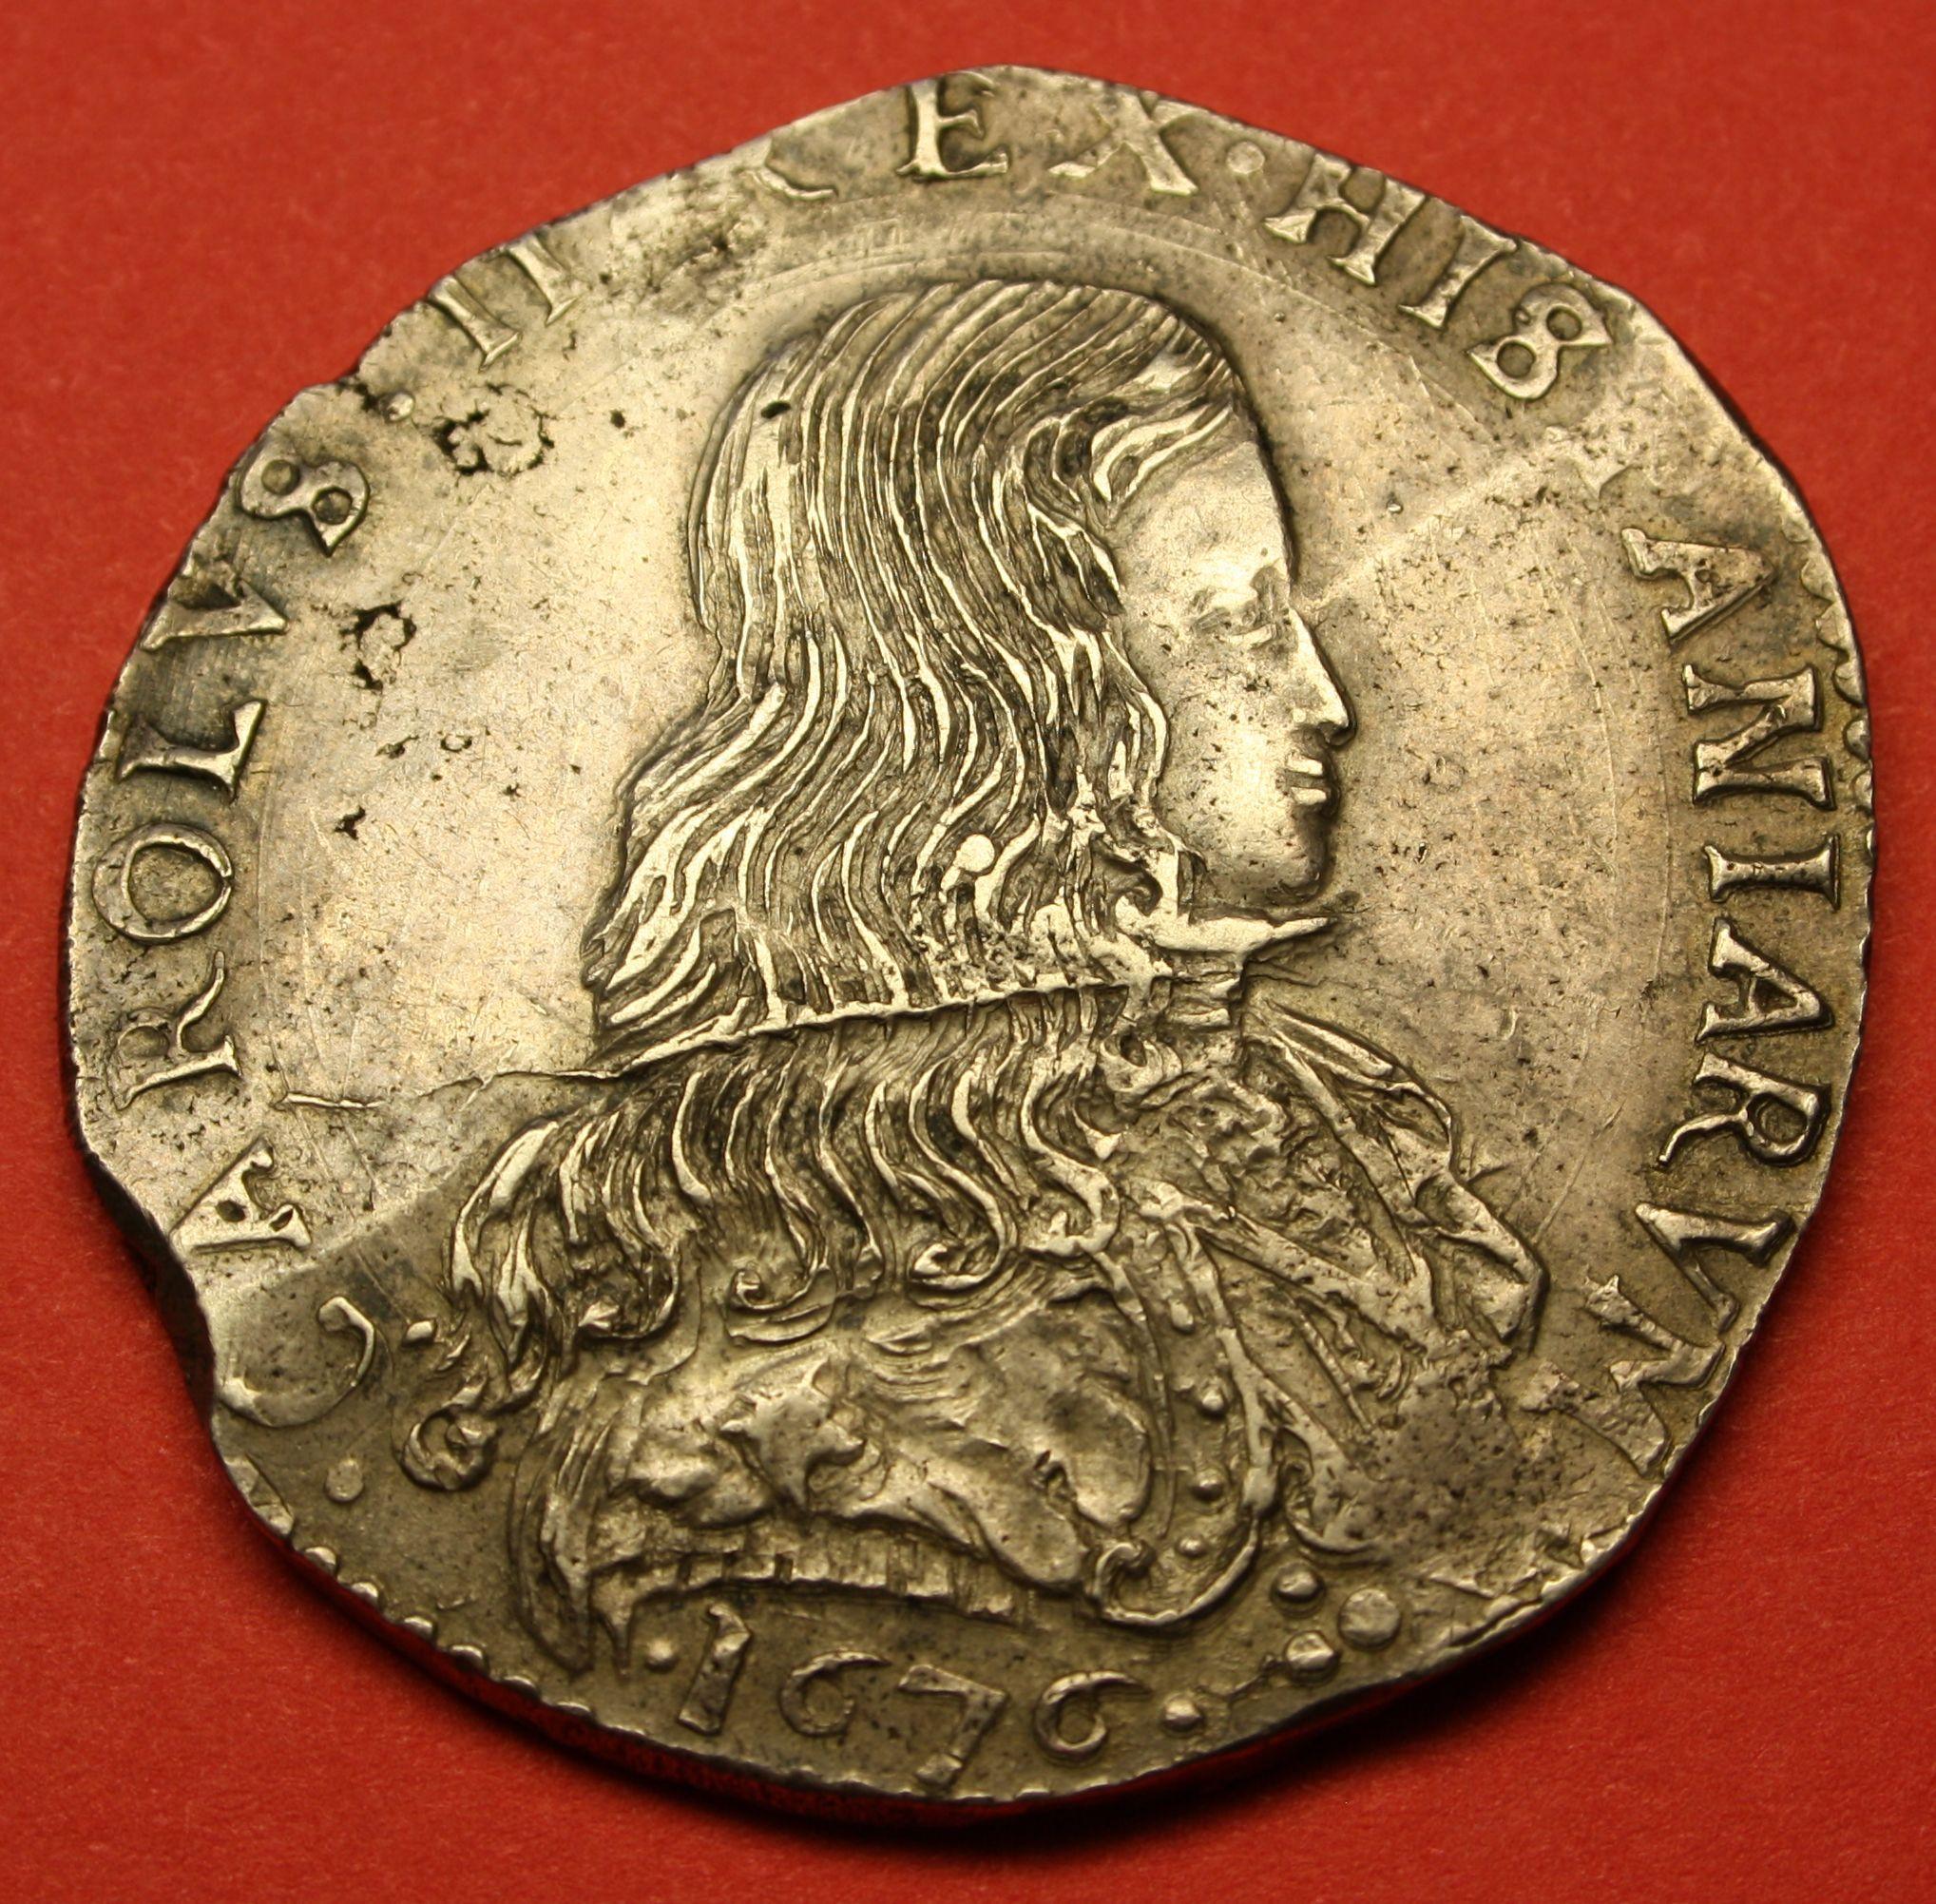 Filippo de Carlos II. Milán C9fa52_3320529f60ac4822869db7def9226bac~mv2_d_2037_2003_s_2